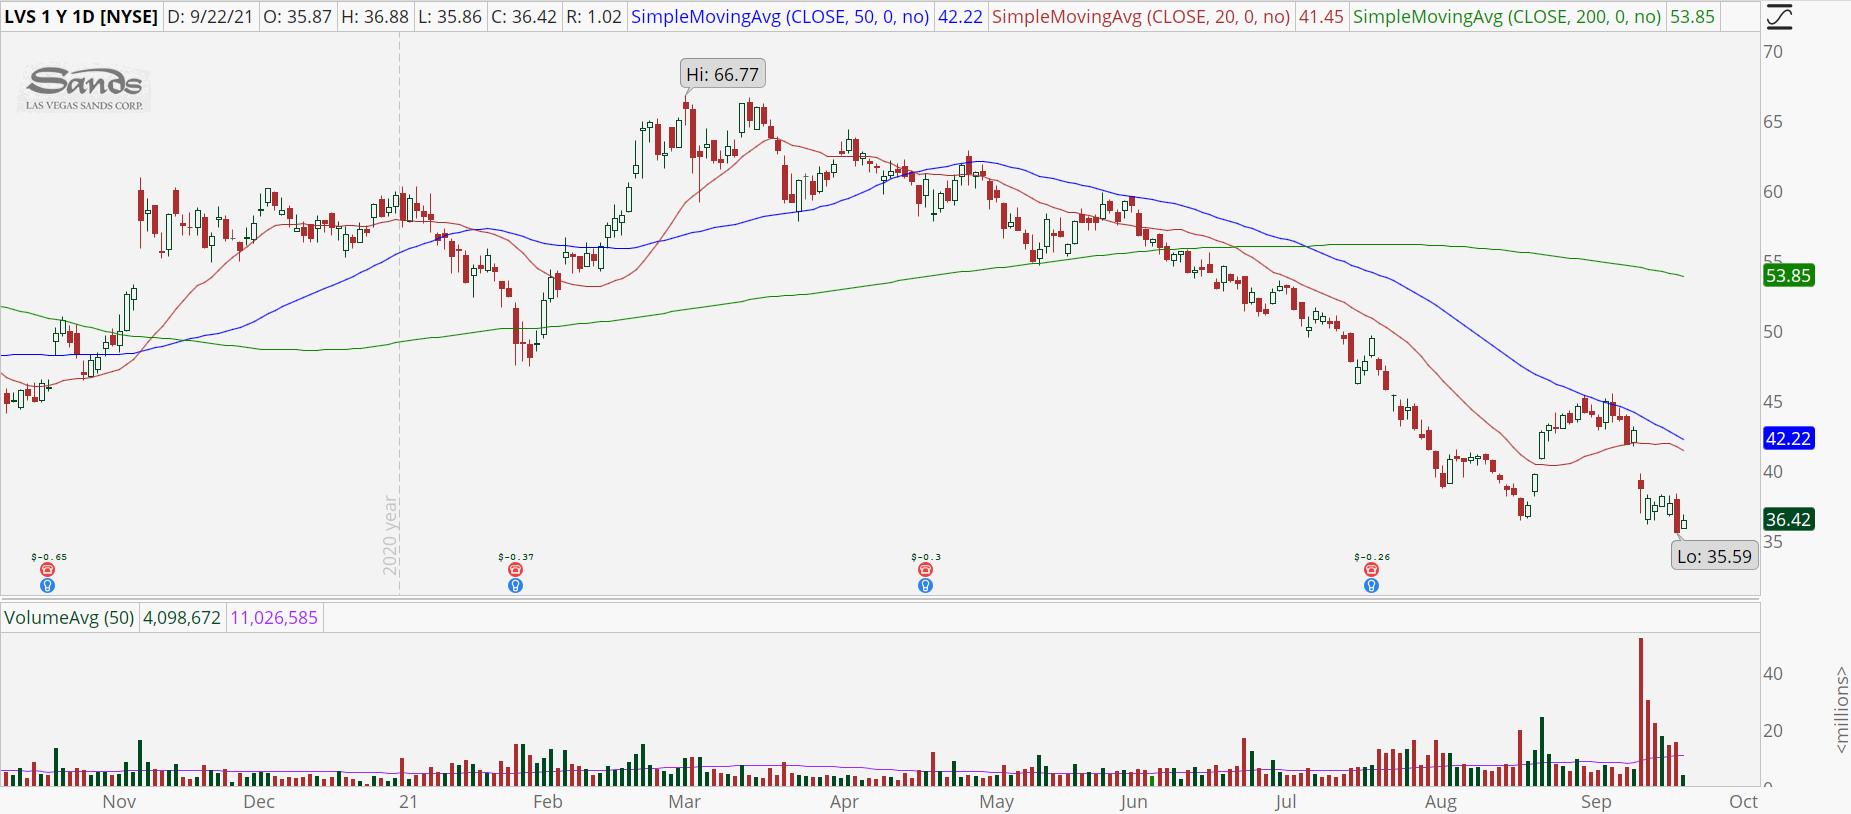 Las Vegas Sands (LVS) stock chart with bearish downtrend.